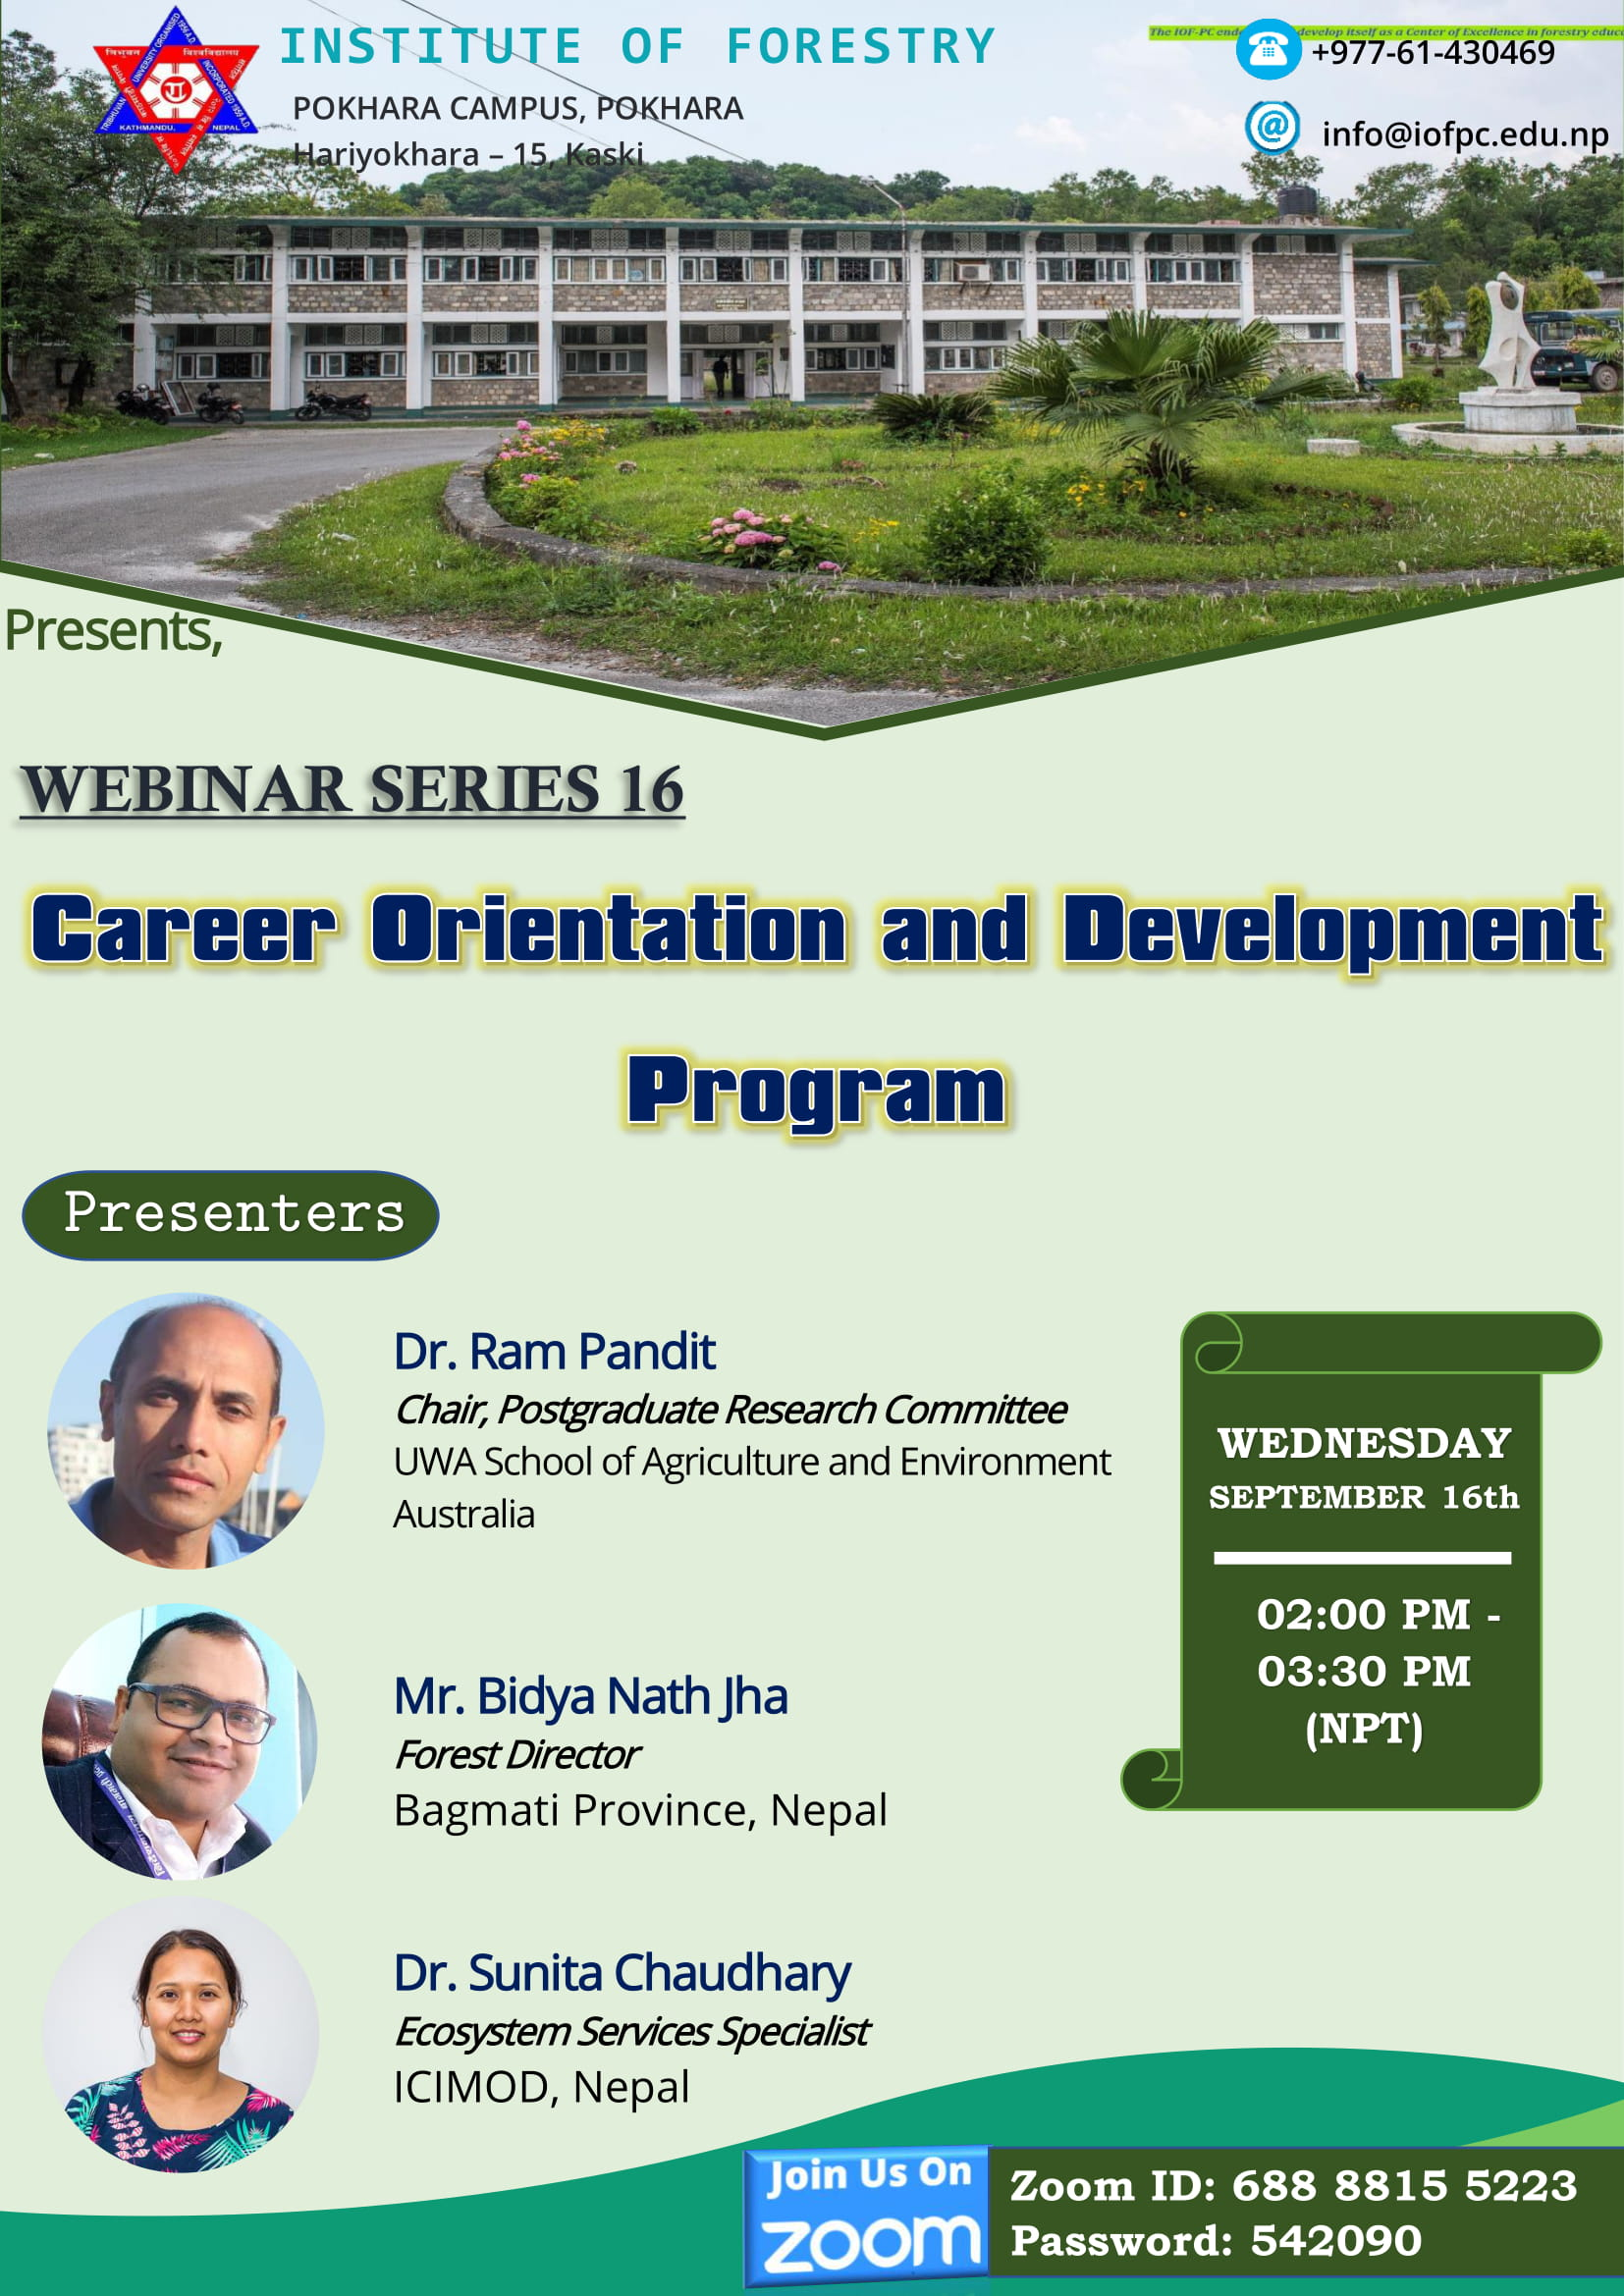 Career-Orientation-and-Development-Program